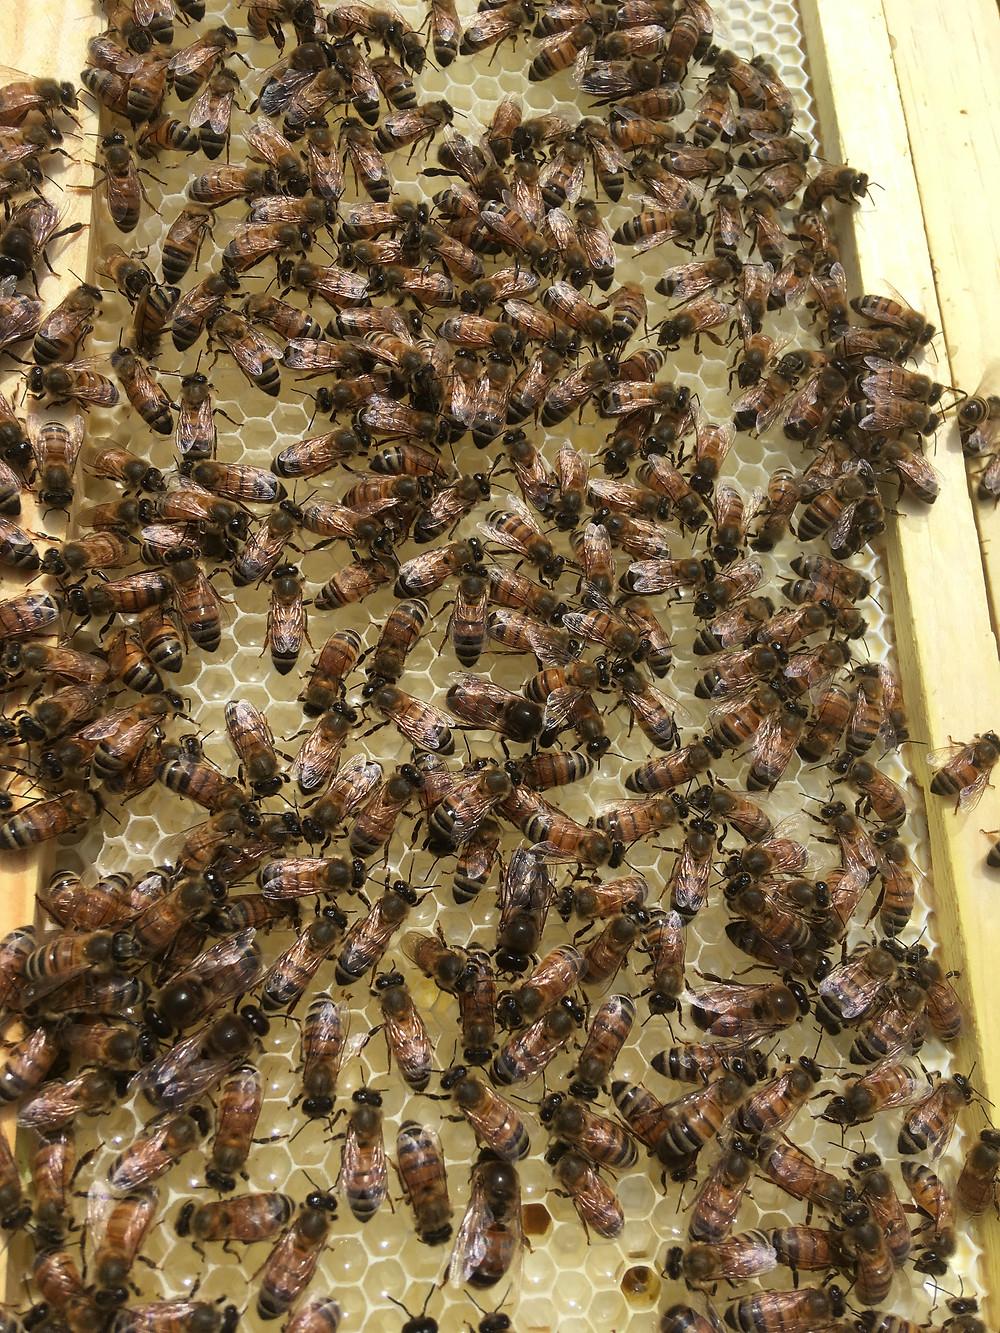 Honey. Frame. Dunham Bees. Farm. London, Ohio.